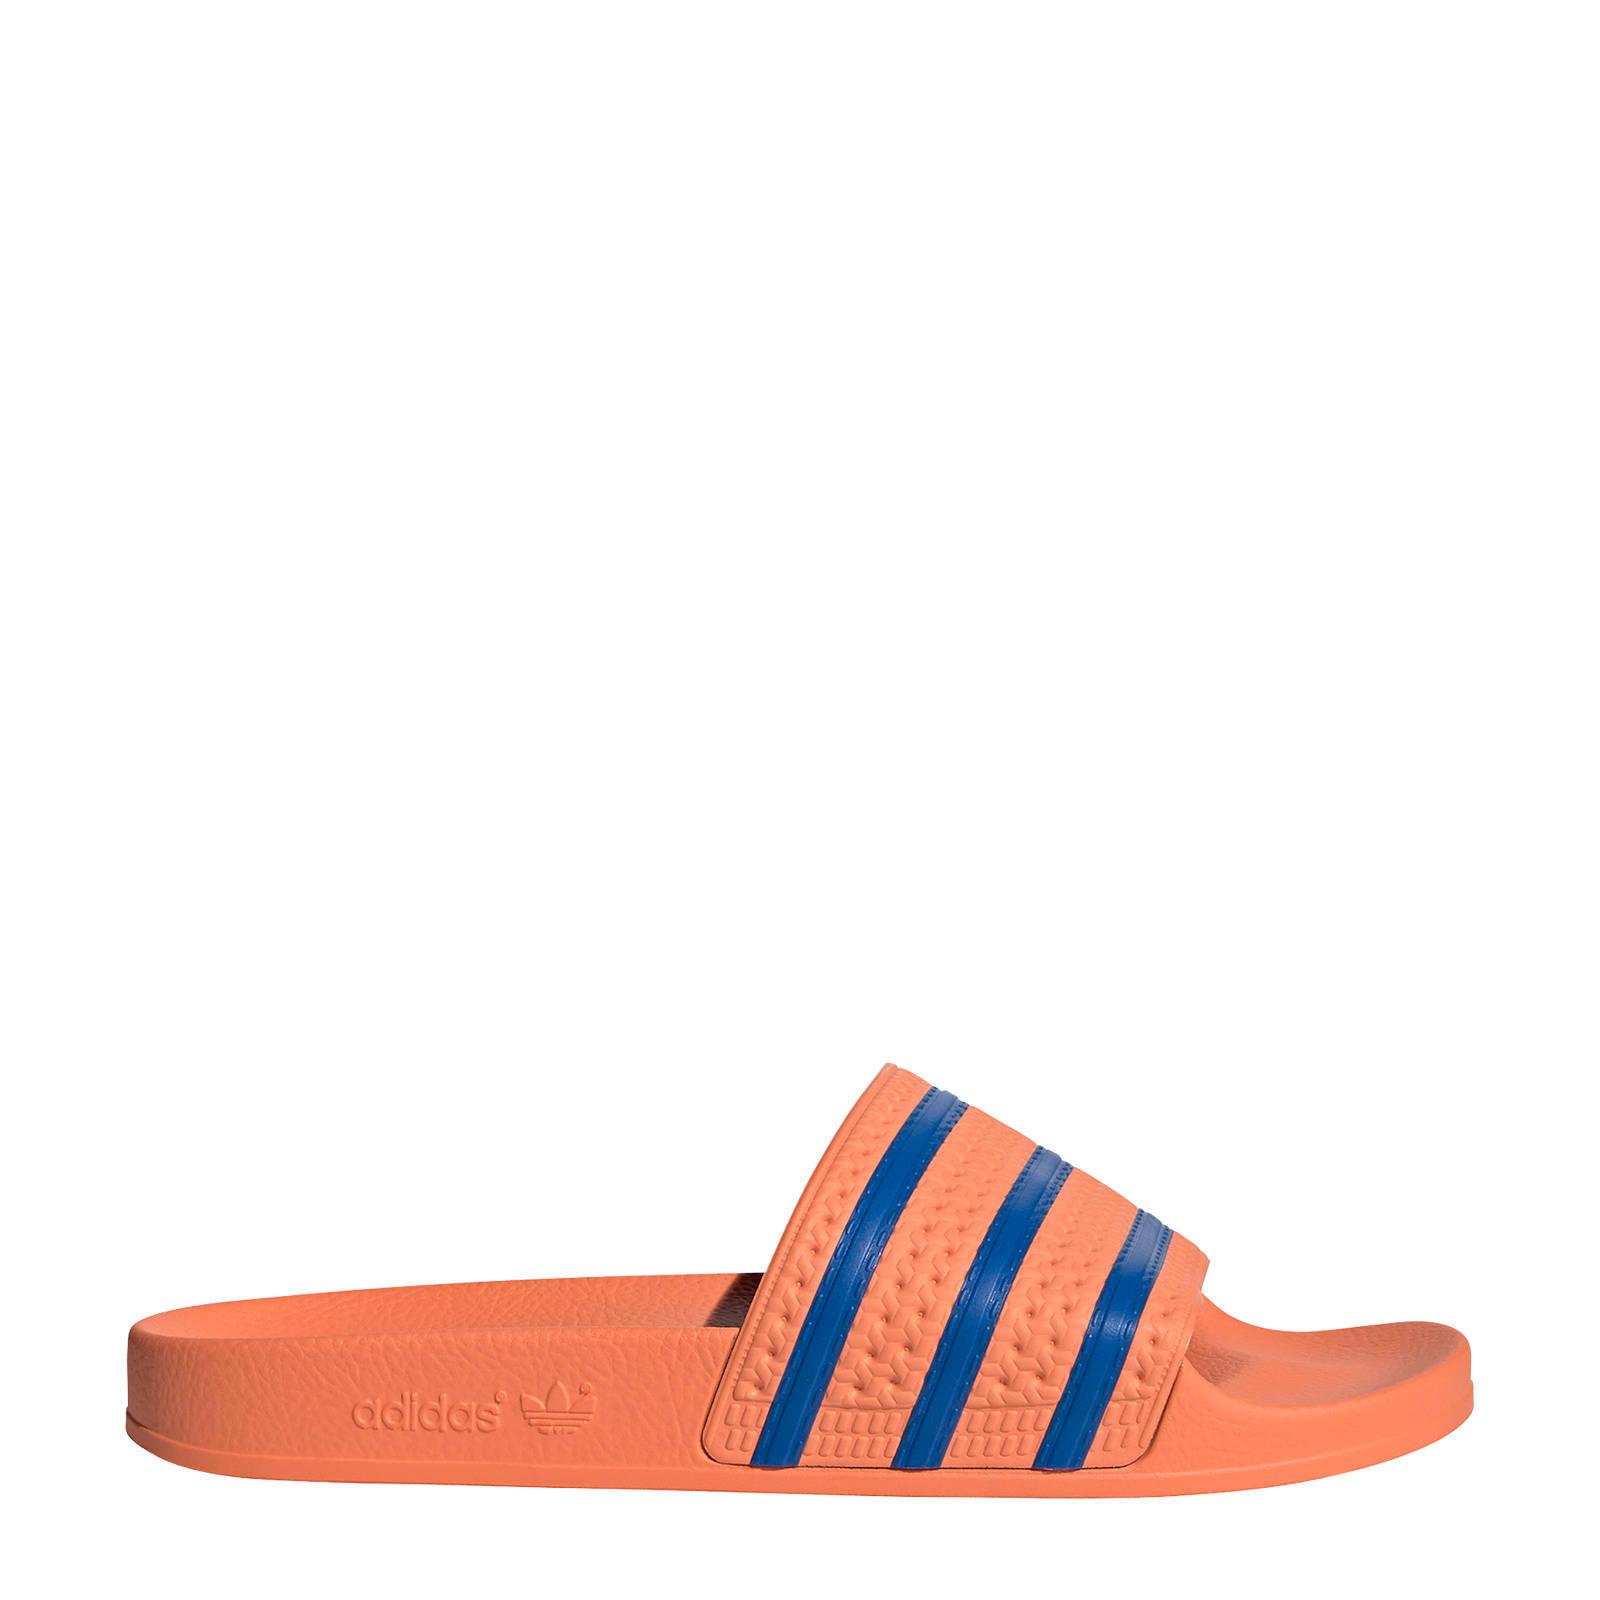 adidas Originals Adilette badslippers rozeblauw | wehkamp